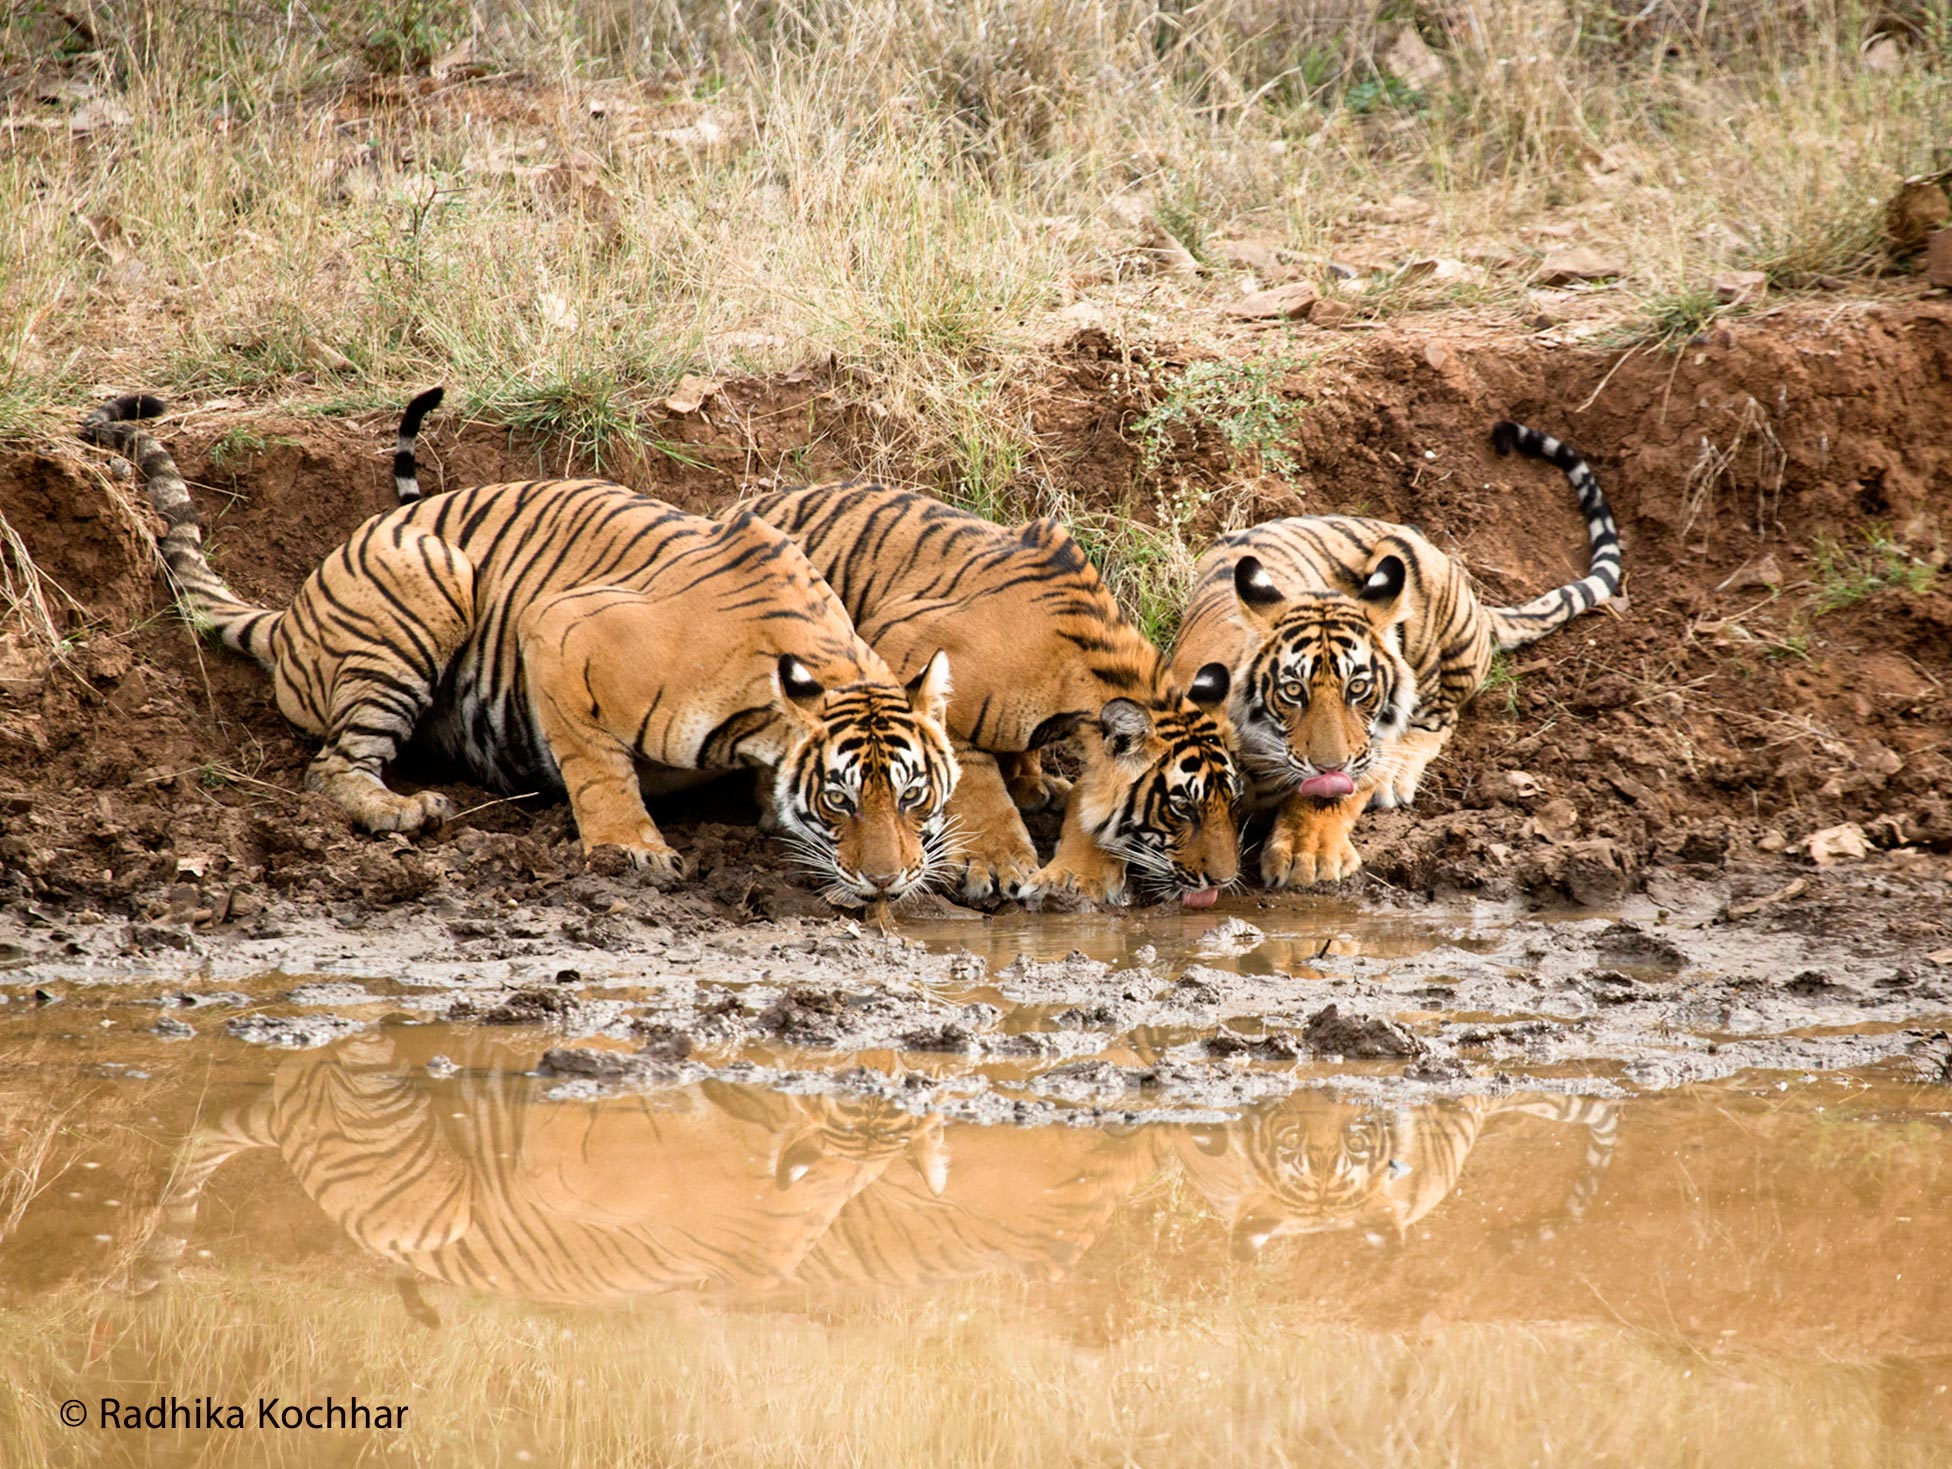 Noor and Cubs